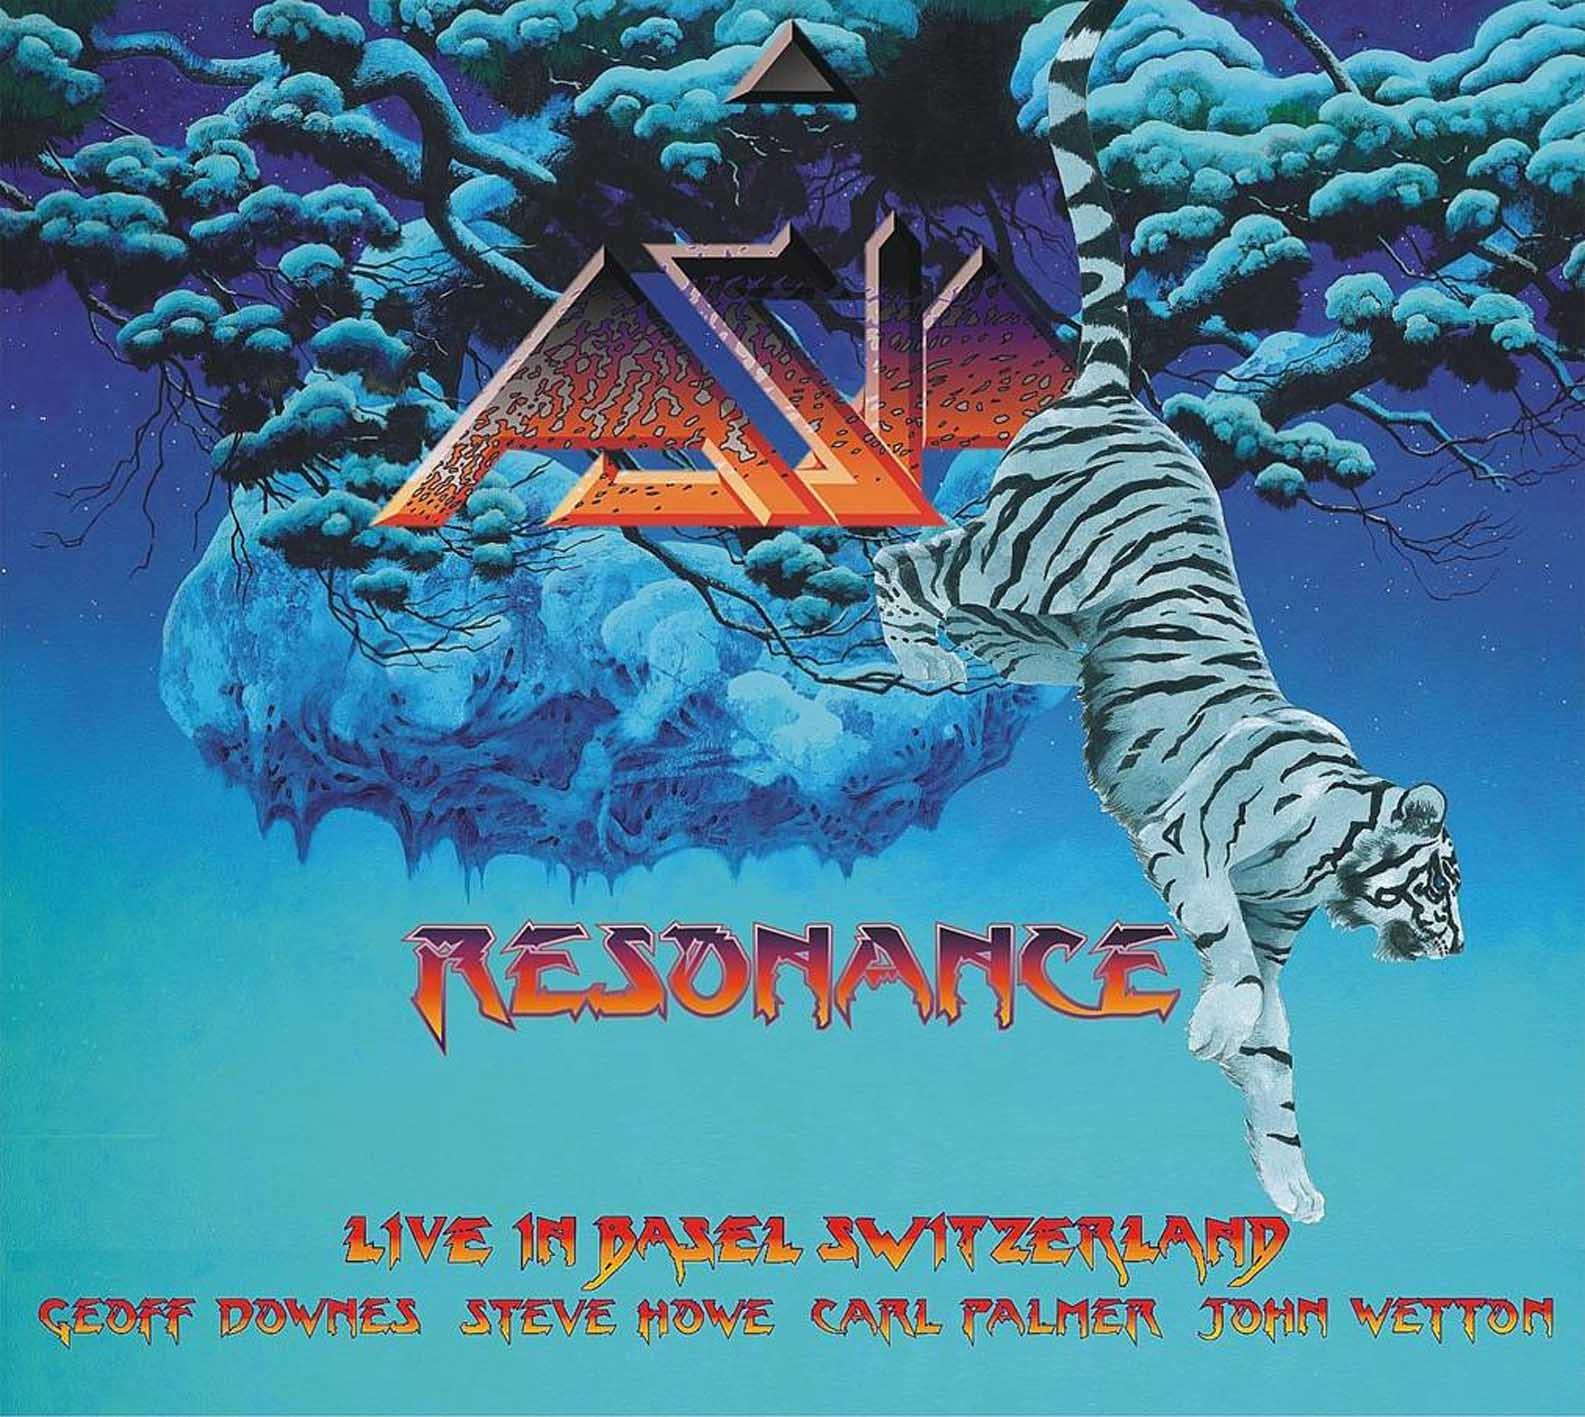 Asia: Resonance - The Omega Tour 2010